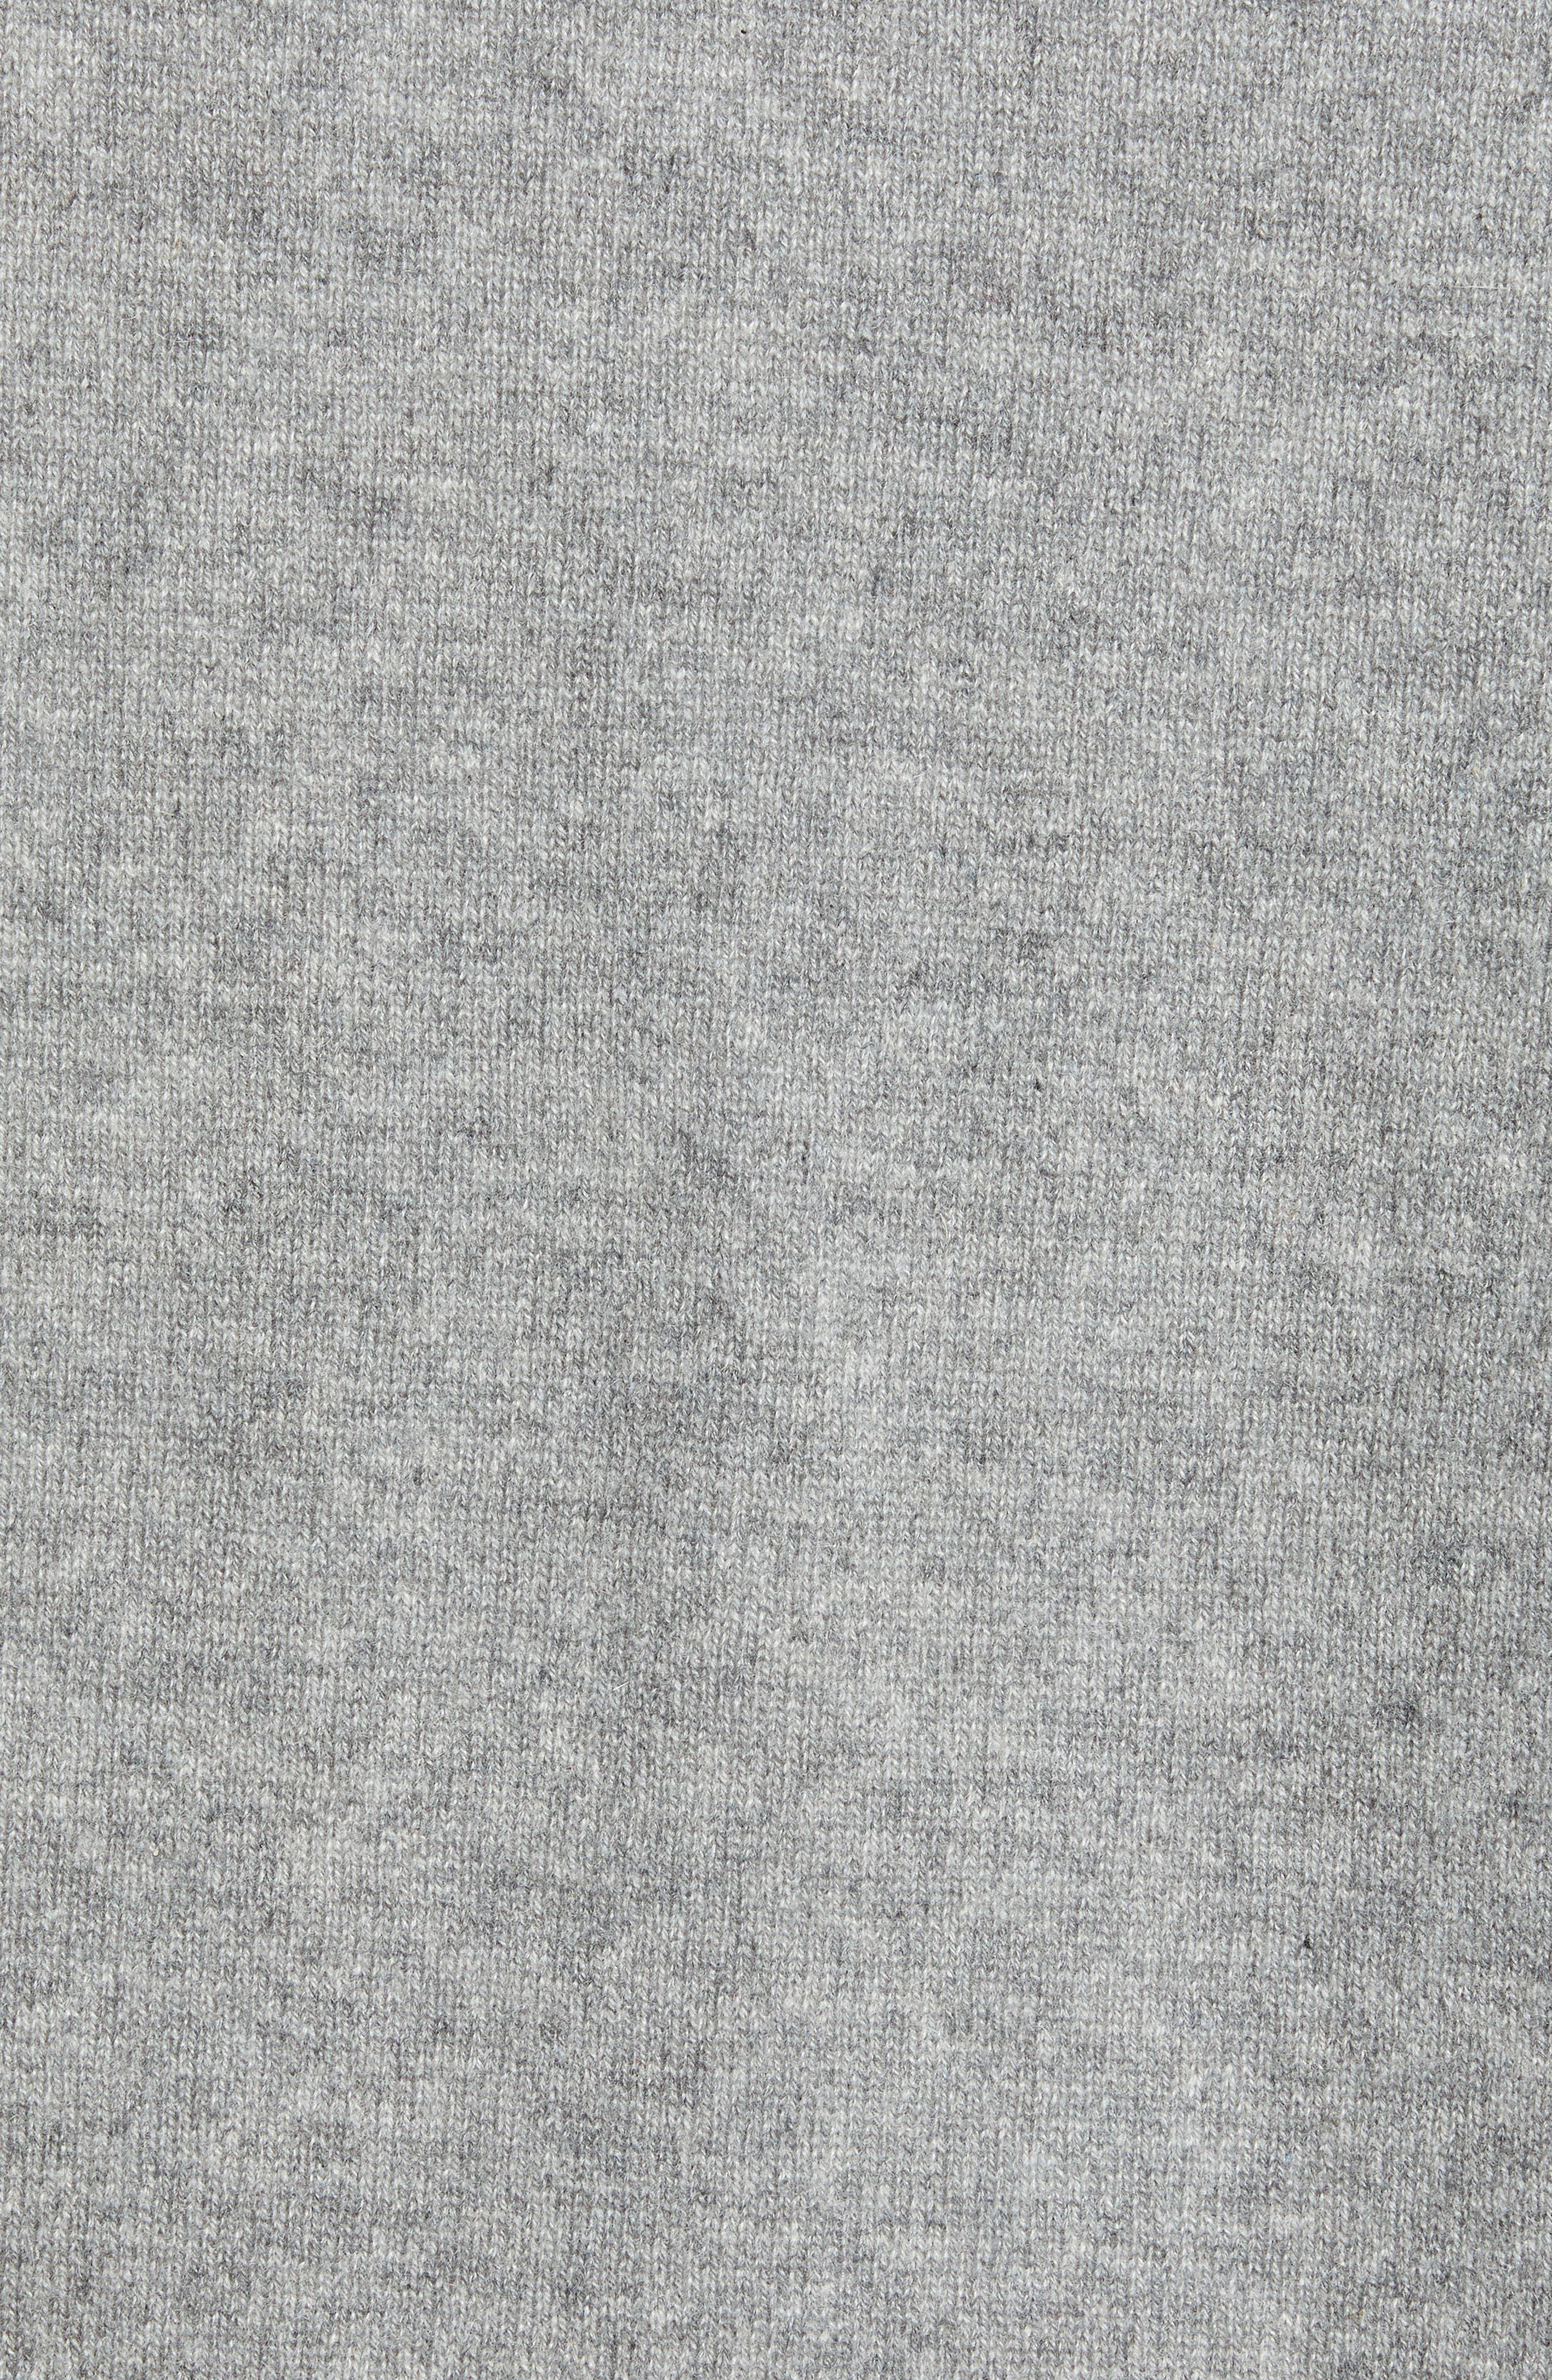 Regular Fit Cashmere Quarter Zip Pullover,                             Alternate thumbnail 5, color,                             GREY DRIFTWOOD